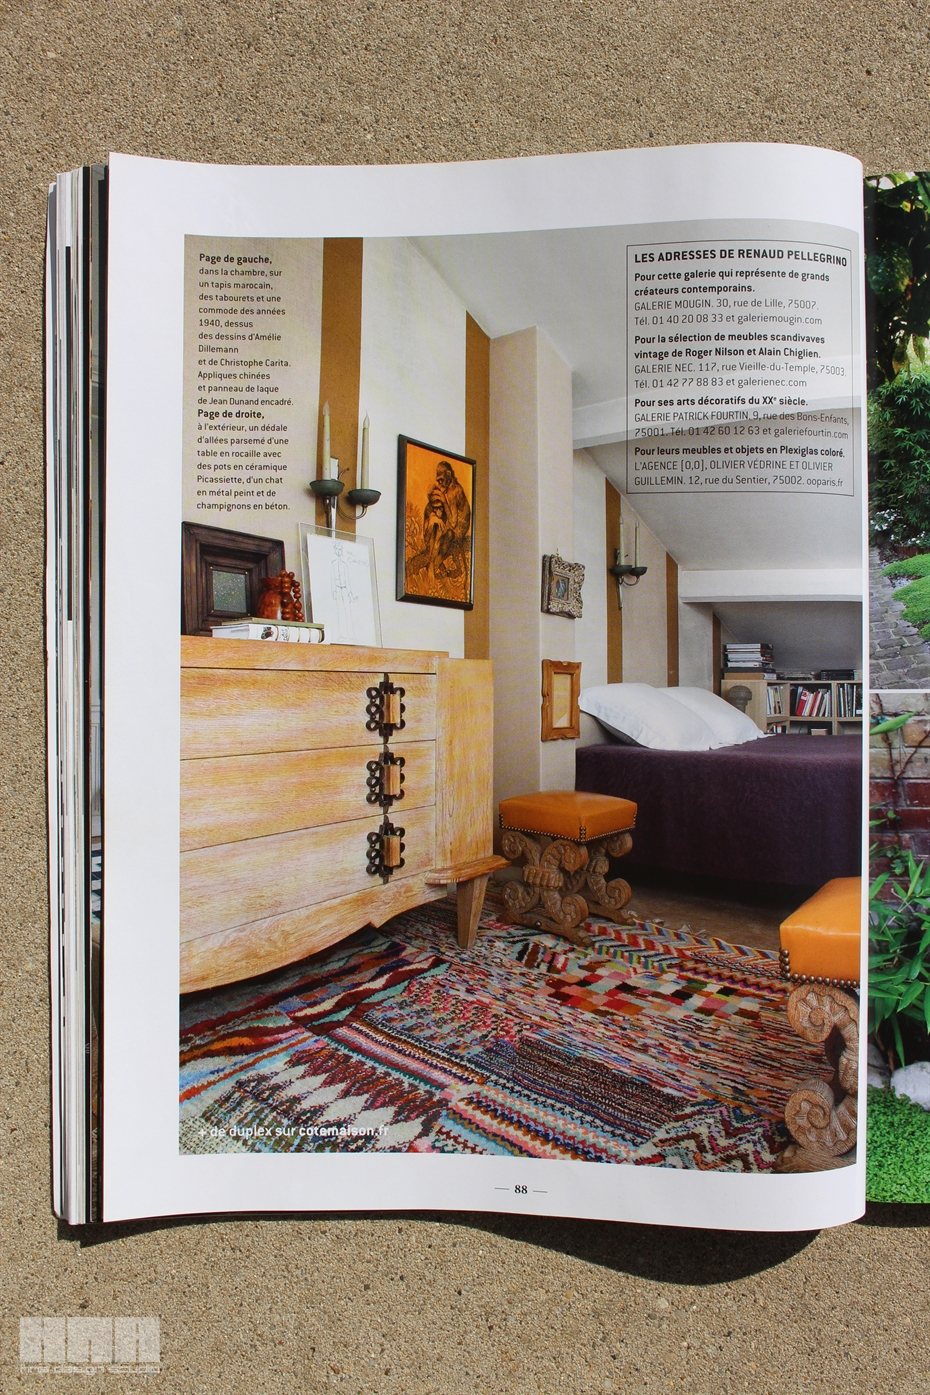 hna design inspiralo magazinok paris 13